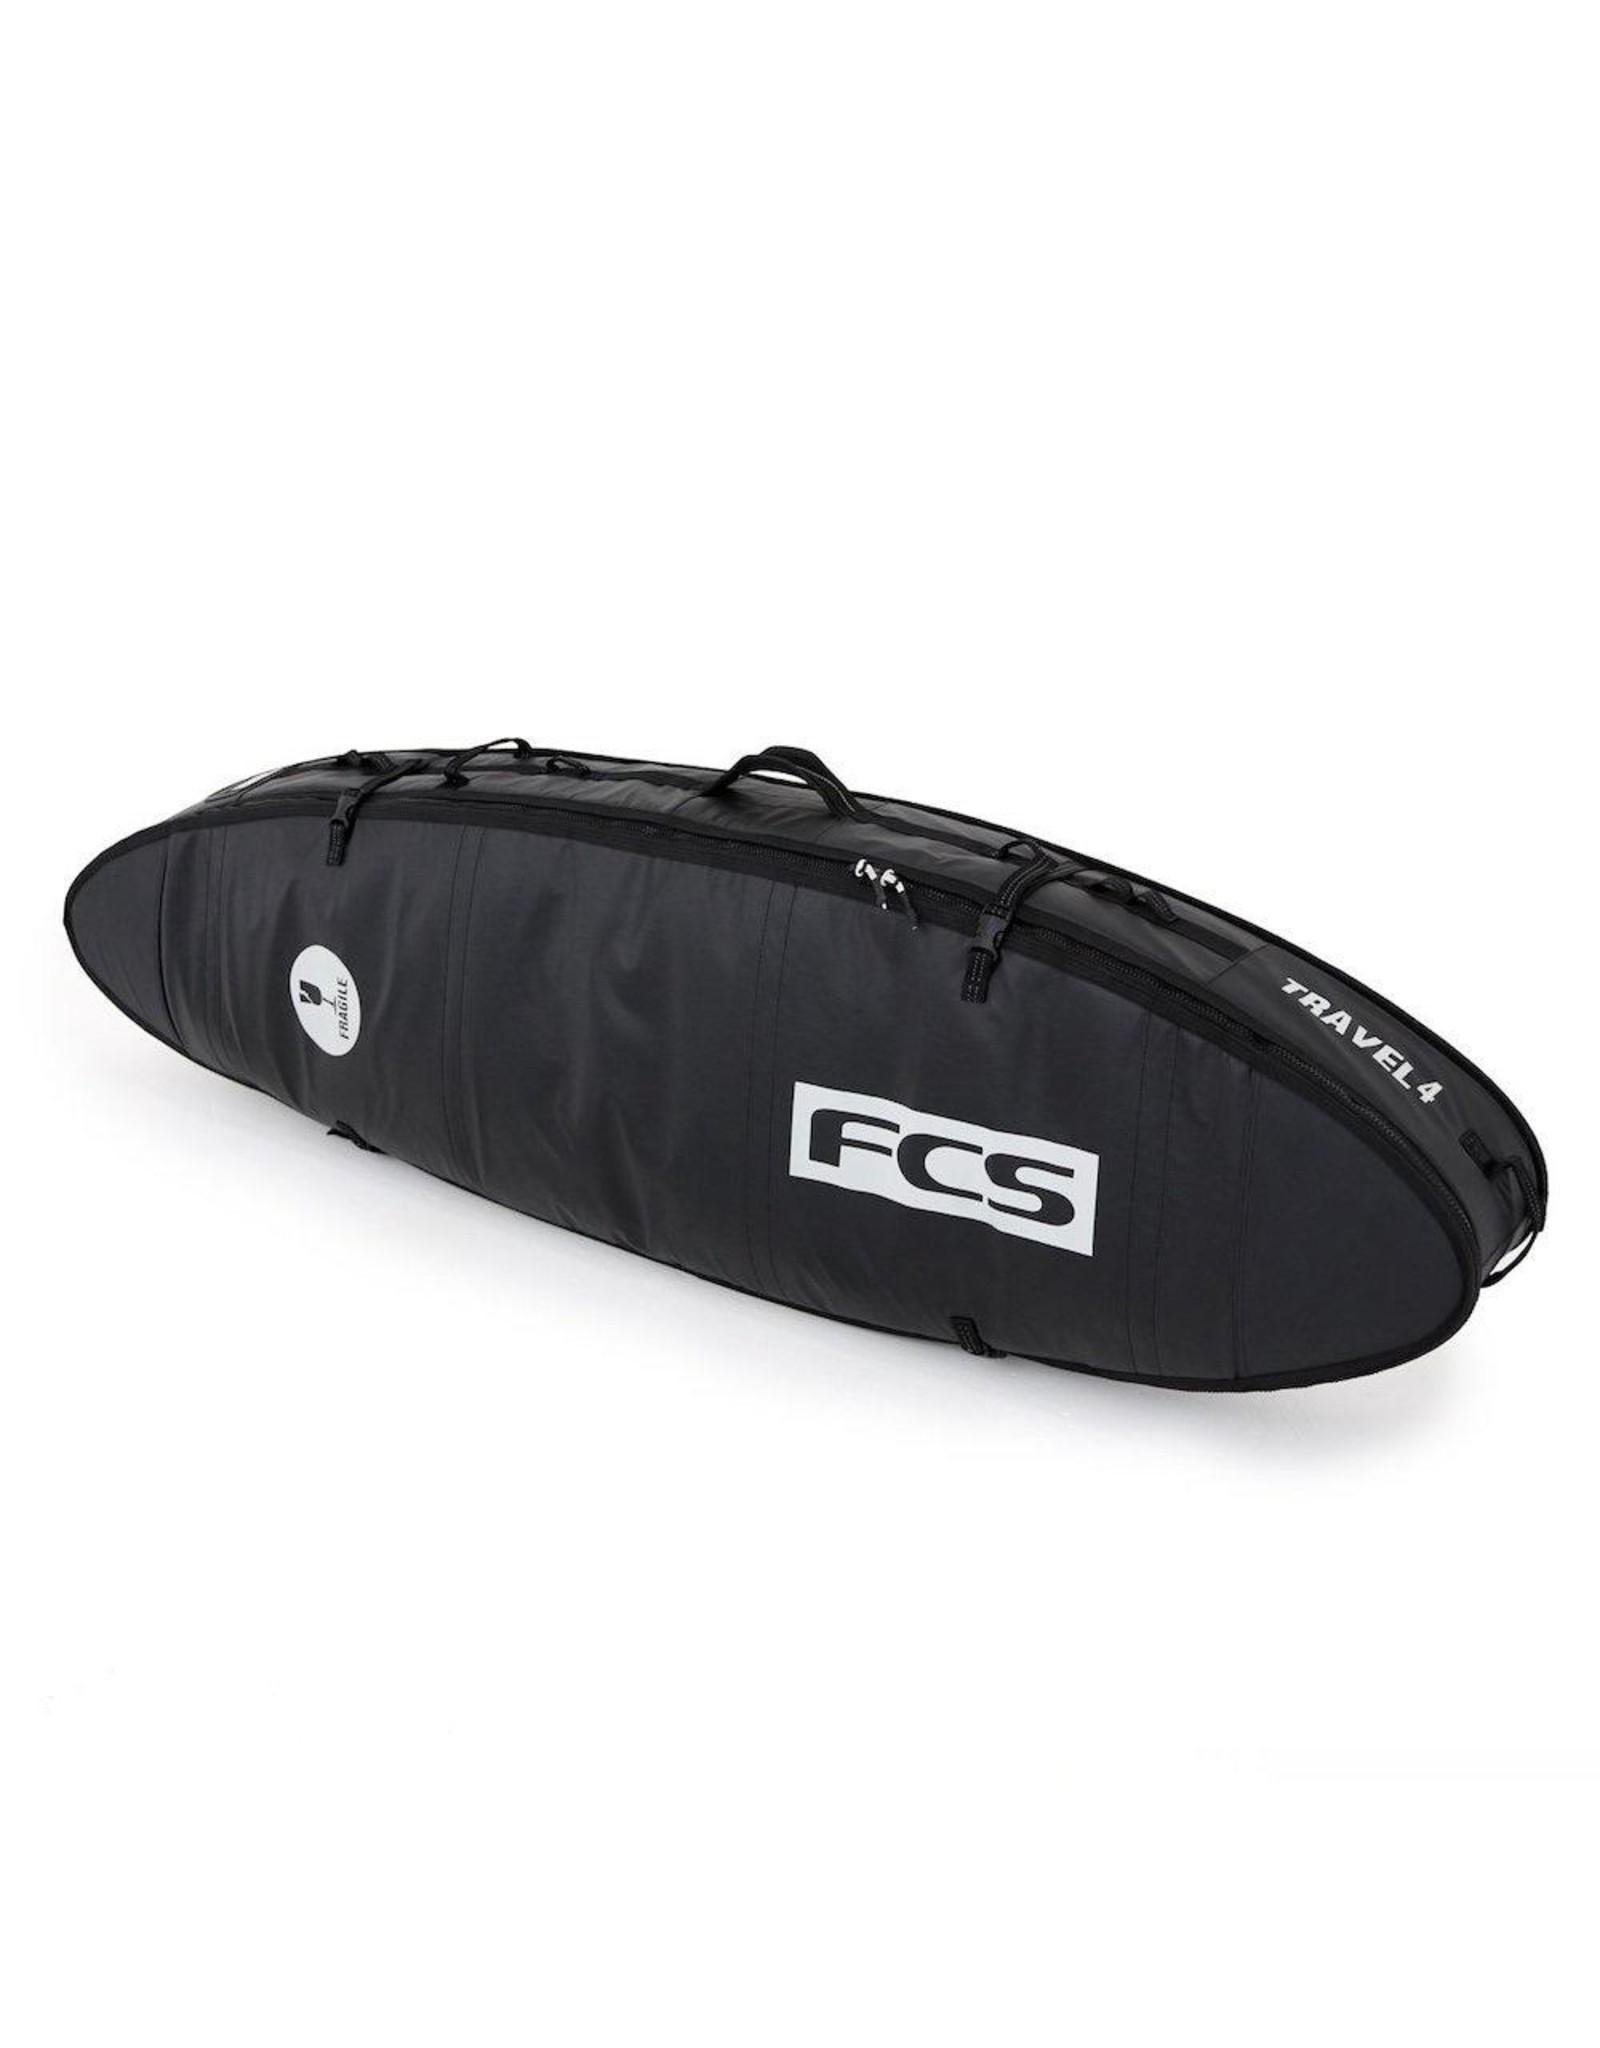 FCS FCS - Travel 4 All Purpose Travel Cover - 6'7 - Black/Grey - Boardbag